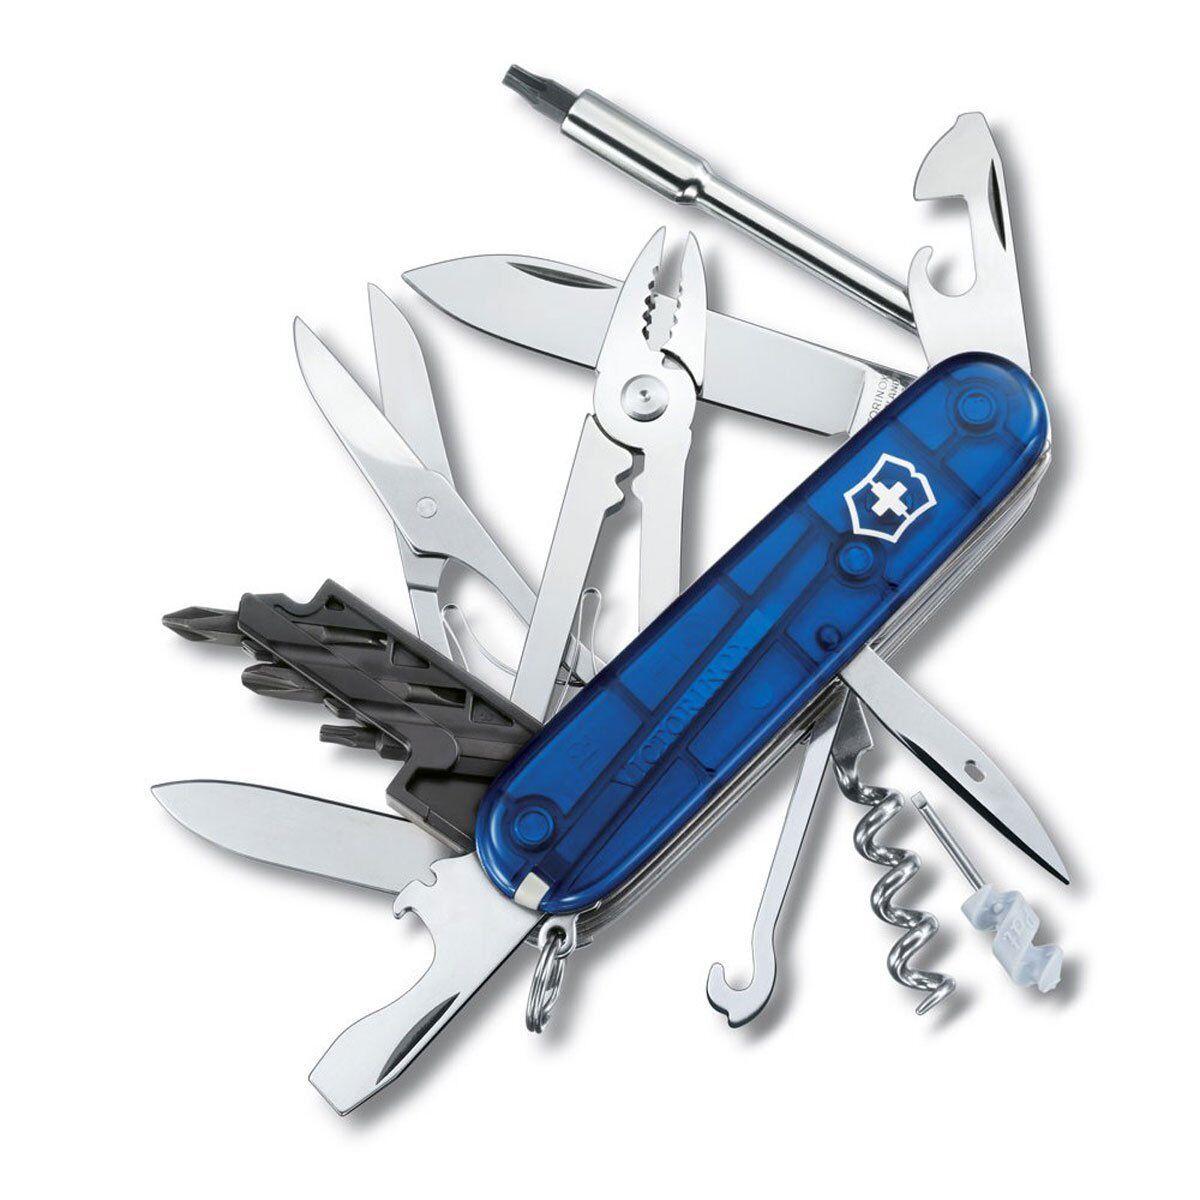 Victorinox Taschenmesser CyberTool CyberTool CyberTool 34 blau 1.7725.T2 neu OVP 62cb12